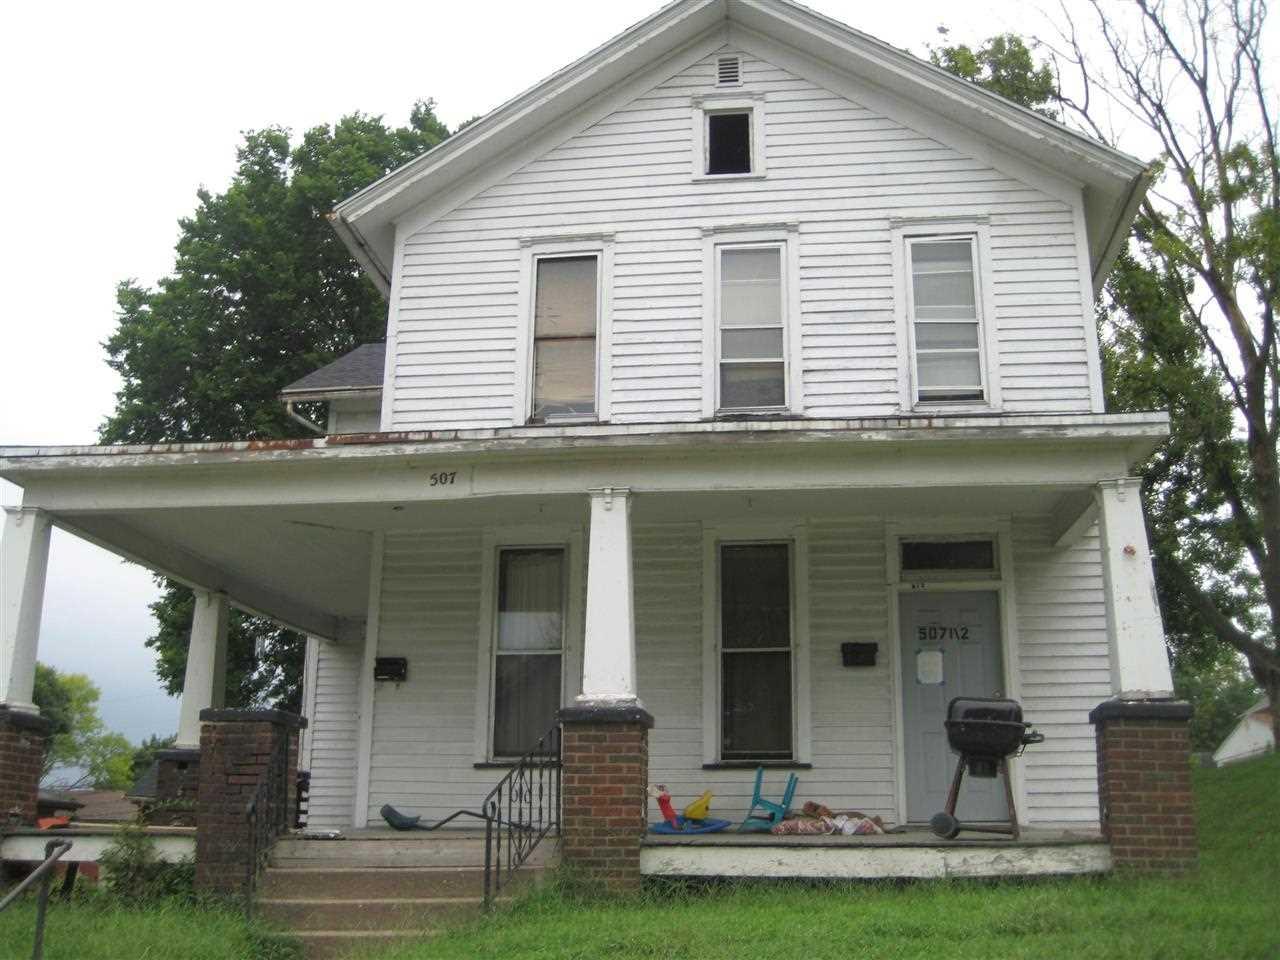 Real Estate for Sale, ListingId: 30096722, Muscatine,IA52761